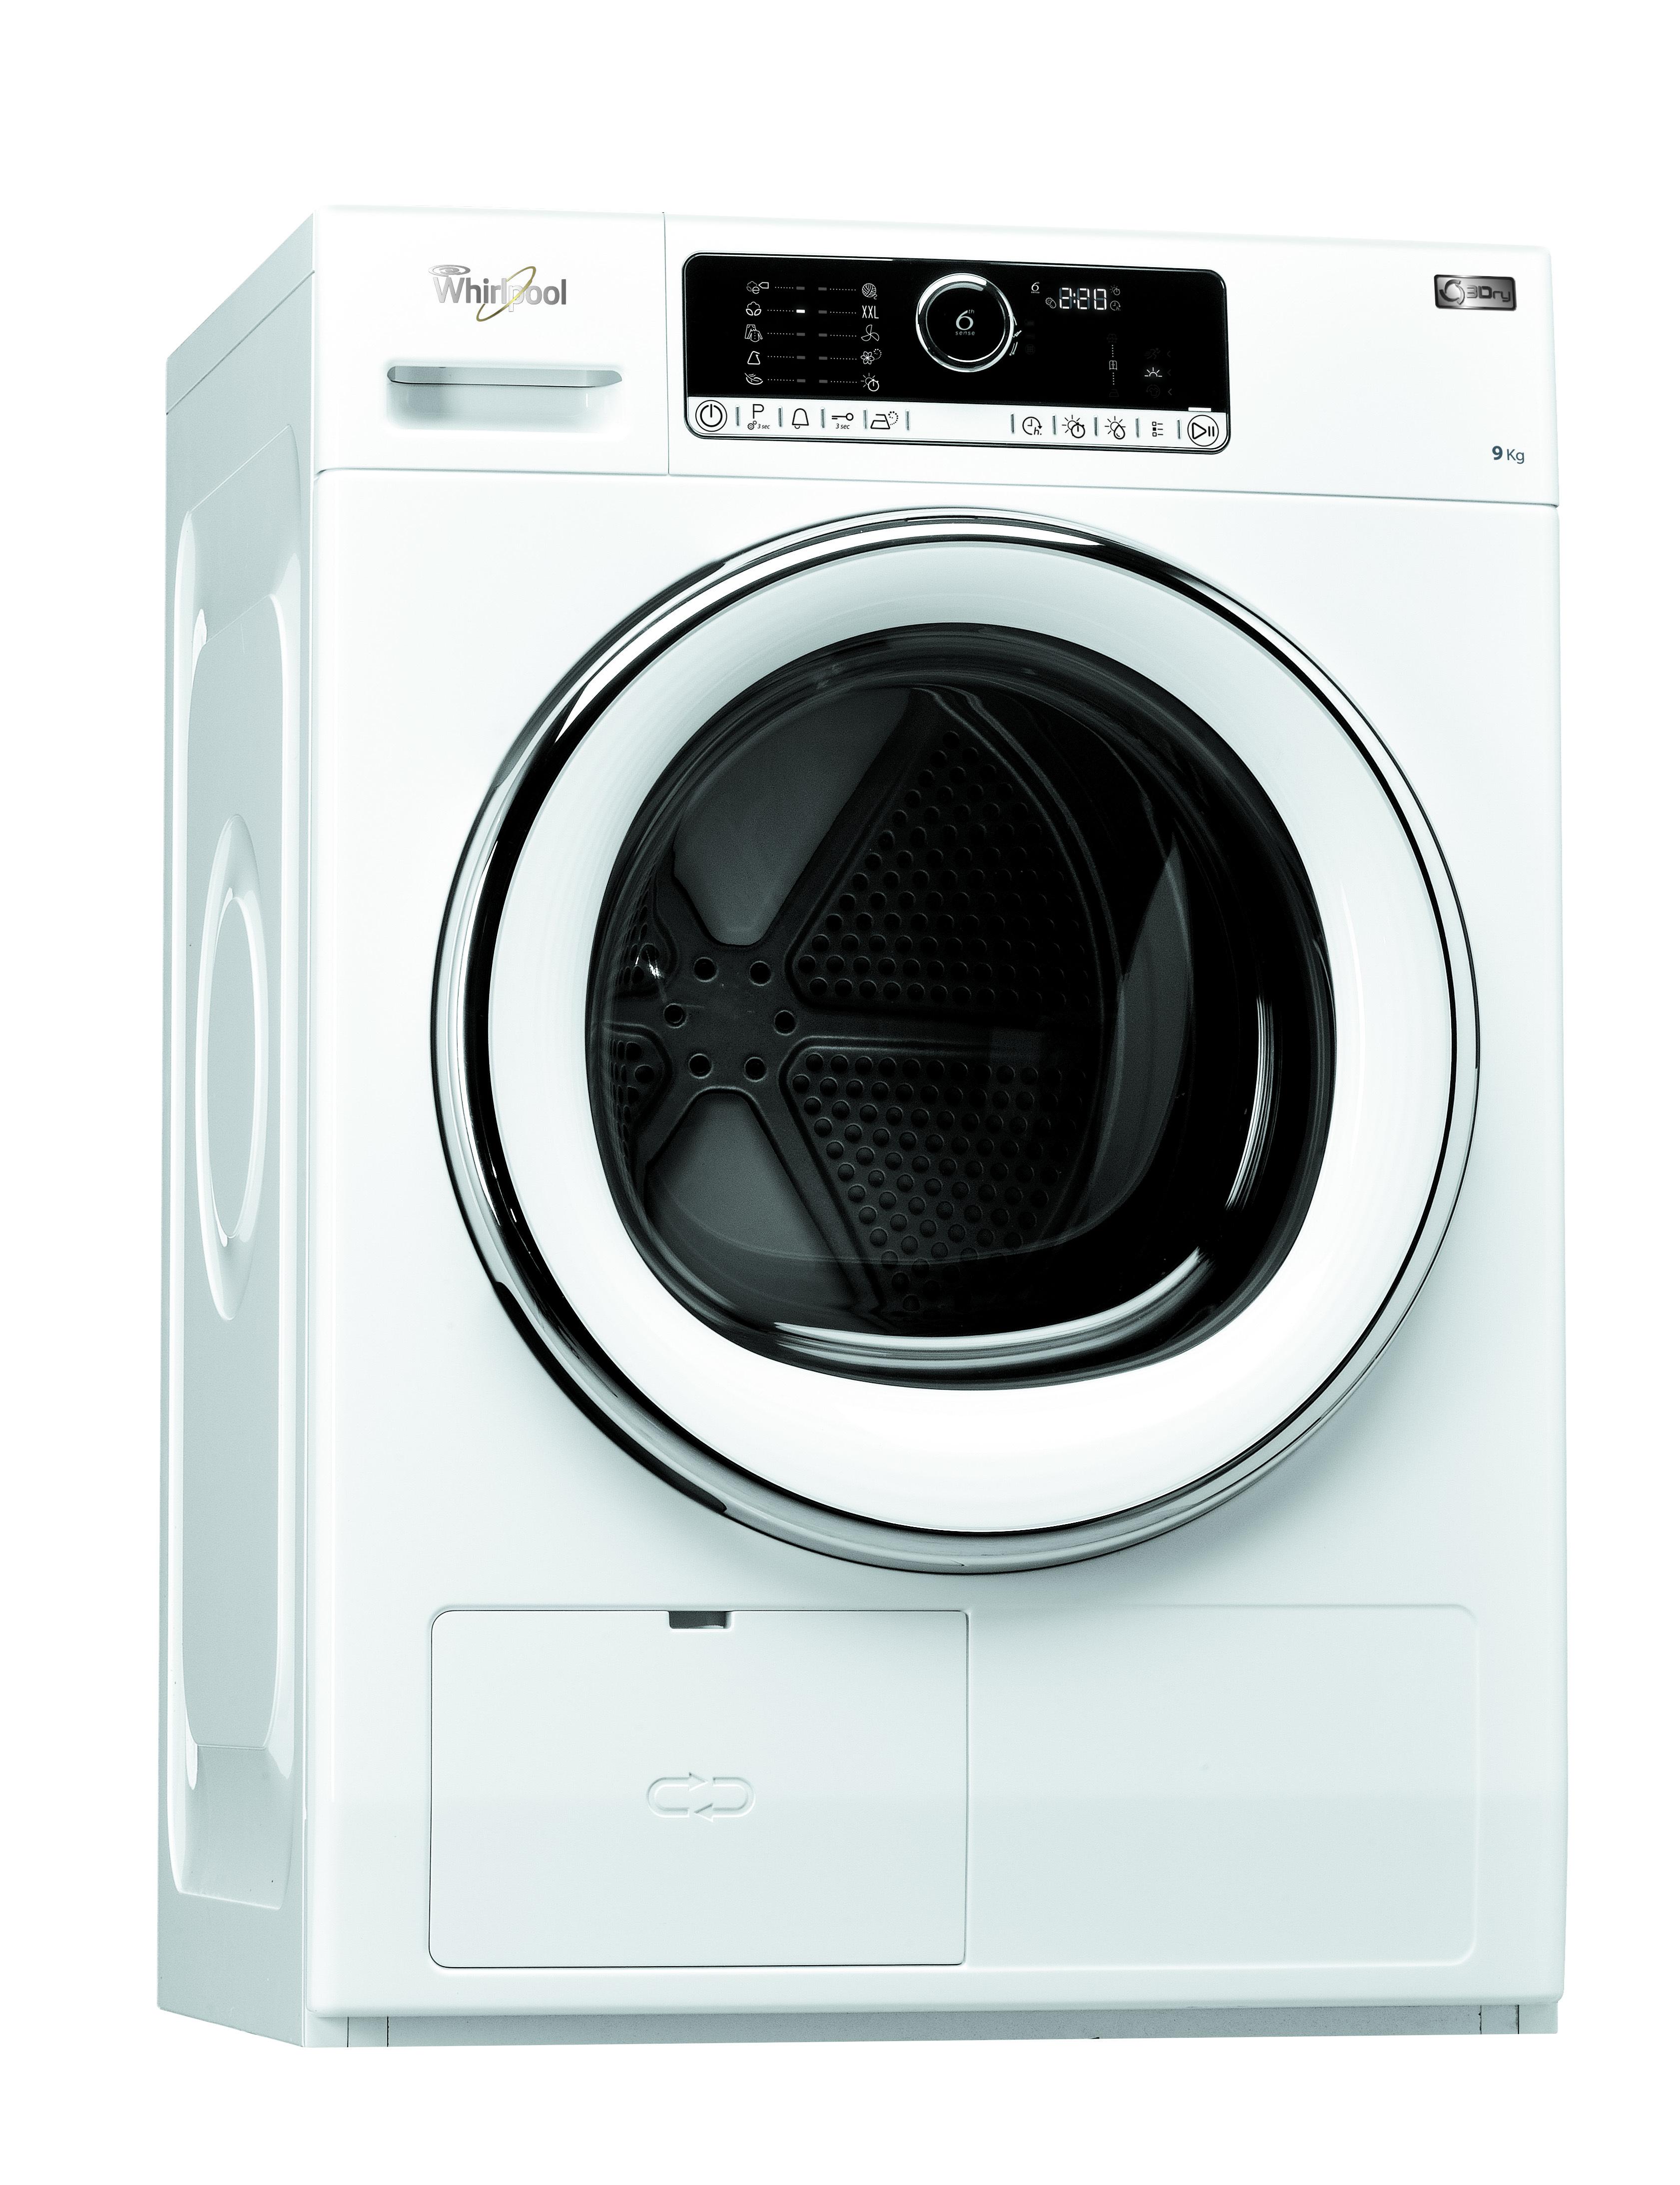 Whirlpool HSCX90420